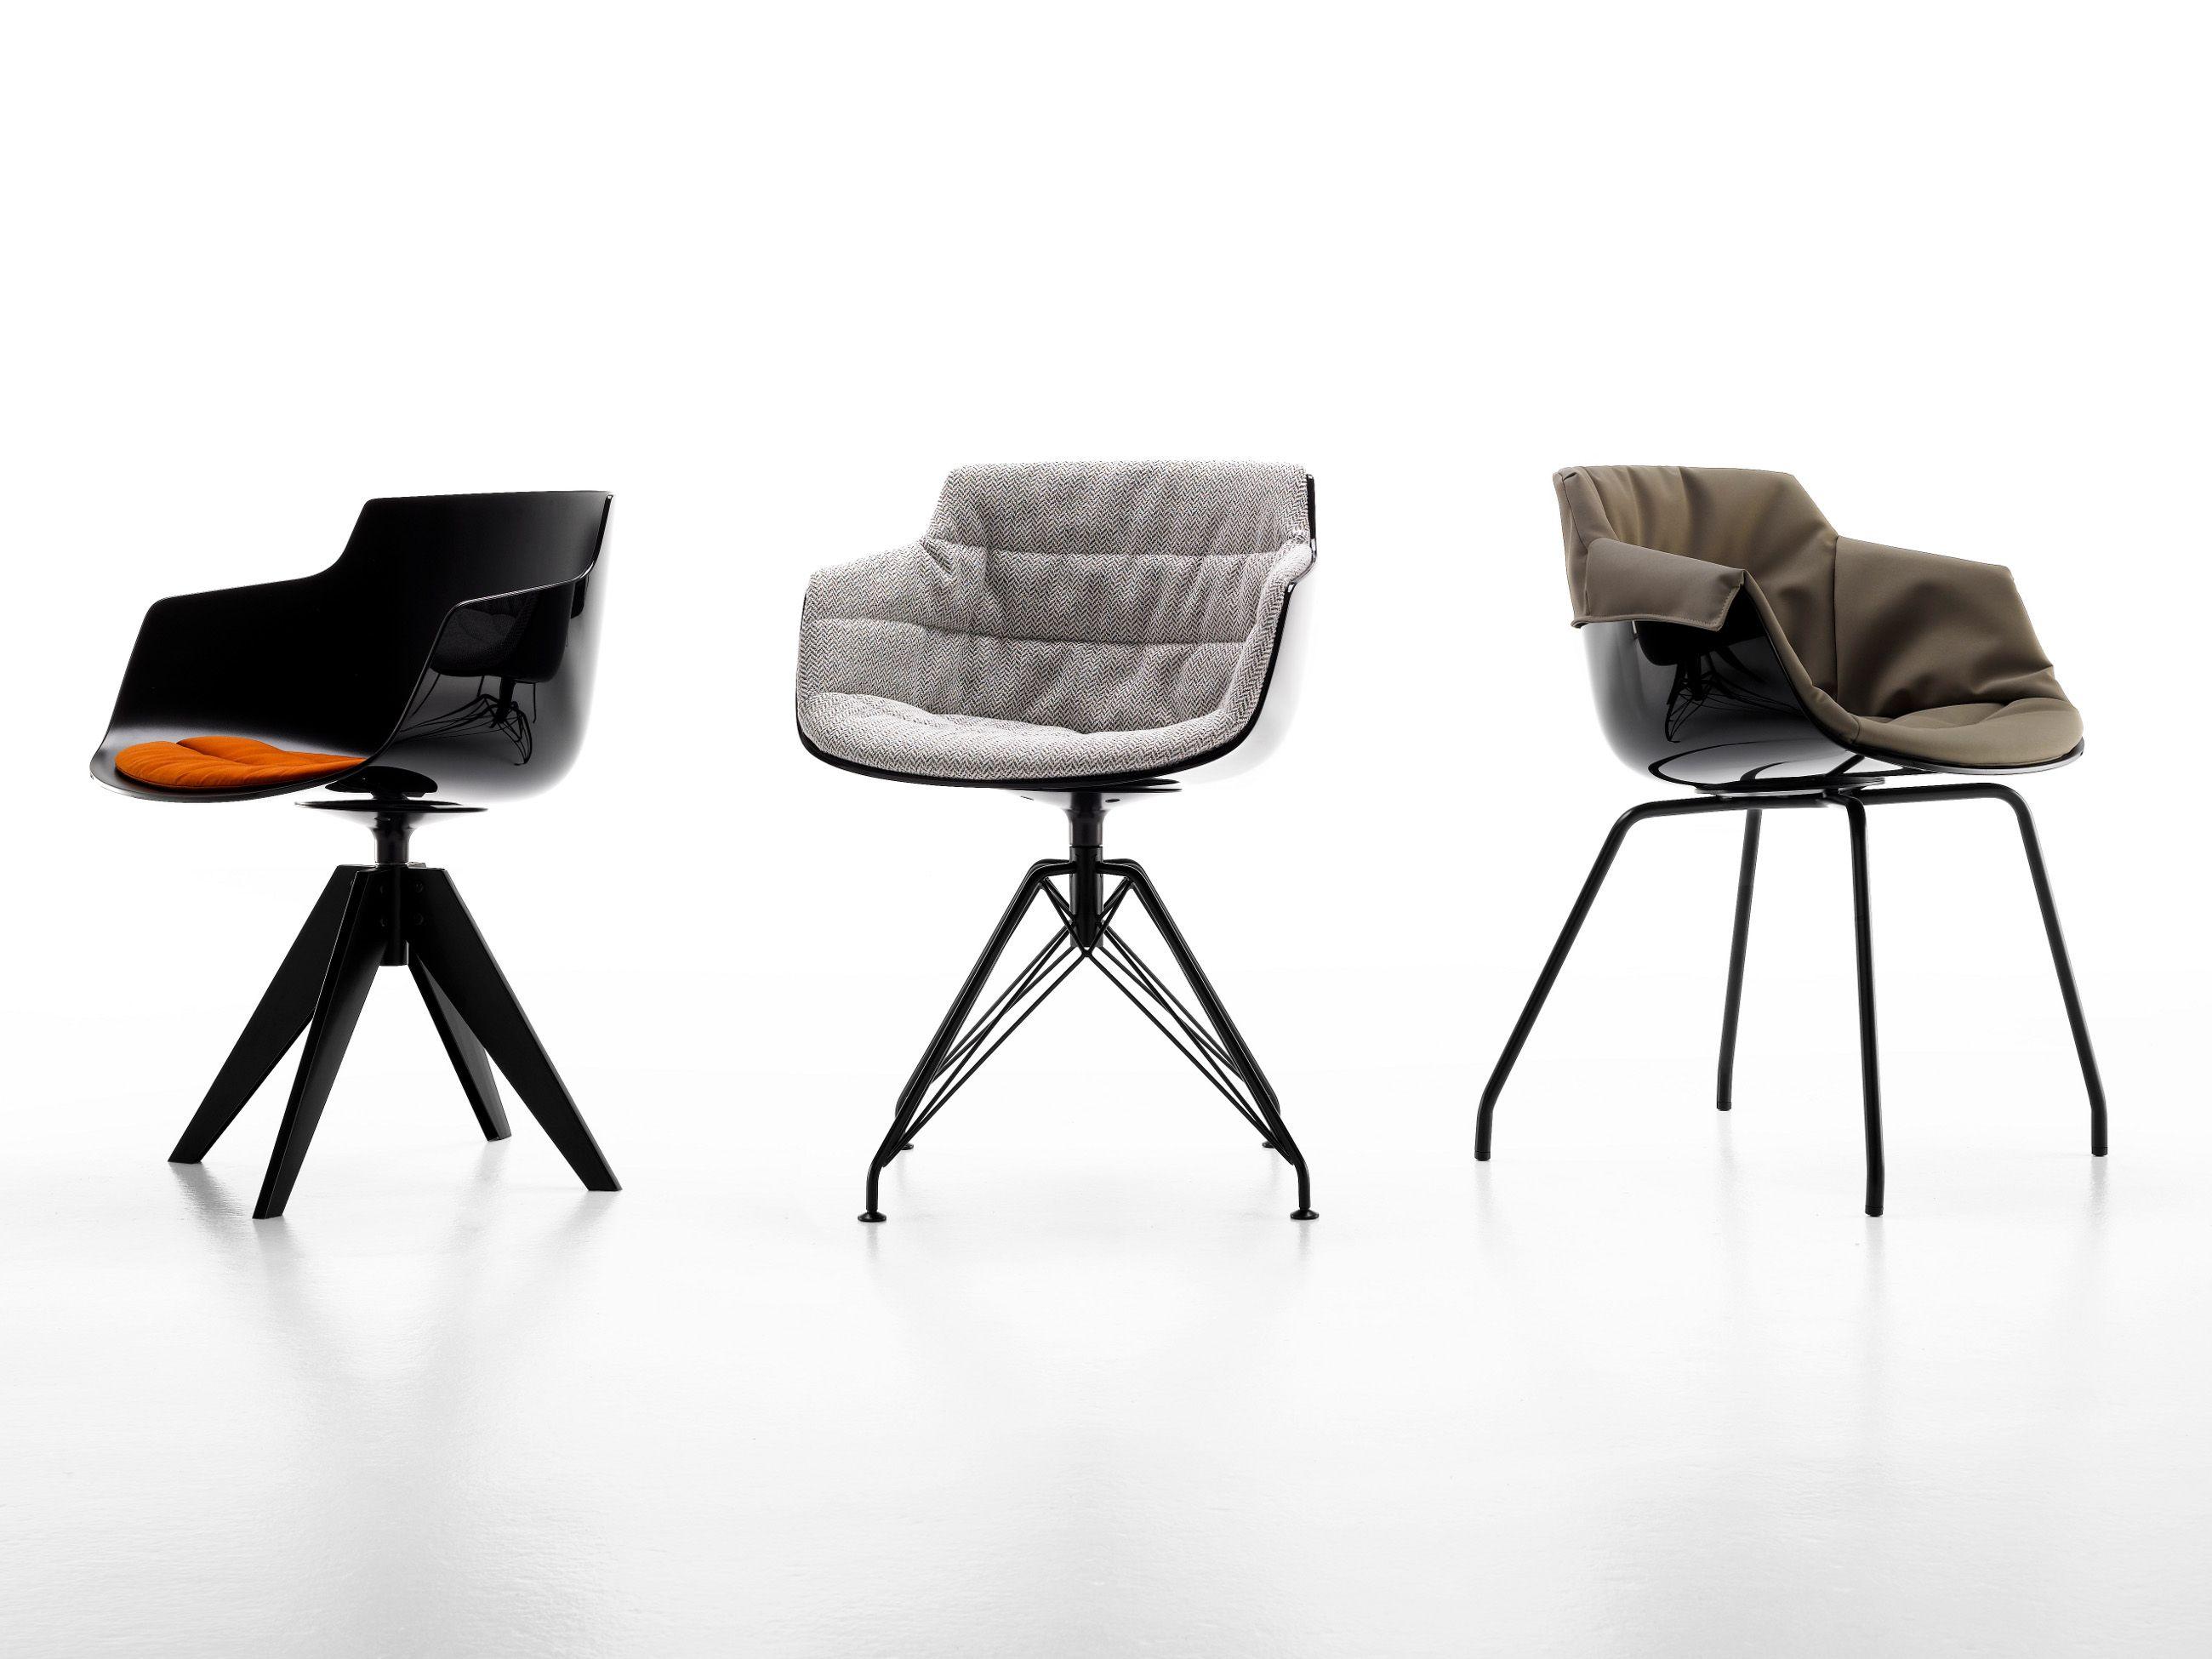 flow slim stuhl aus polycarbonat by mdf italia design jean. Black Bedroom Furniture Sets. Home Design Ideas